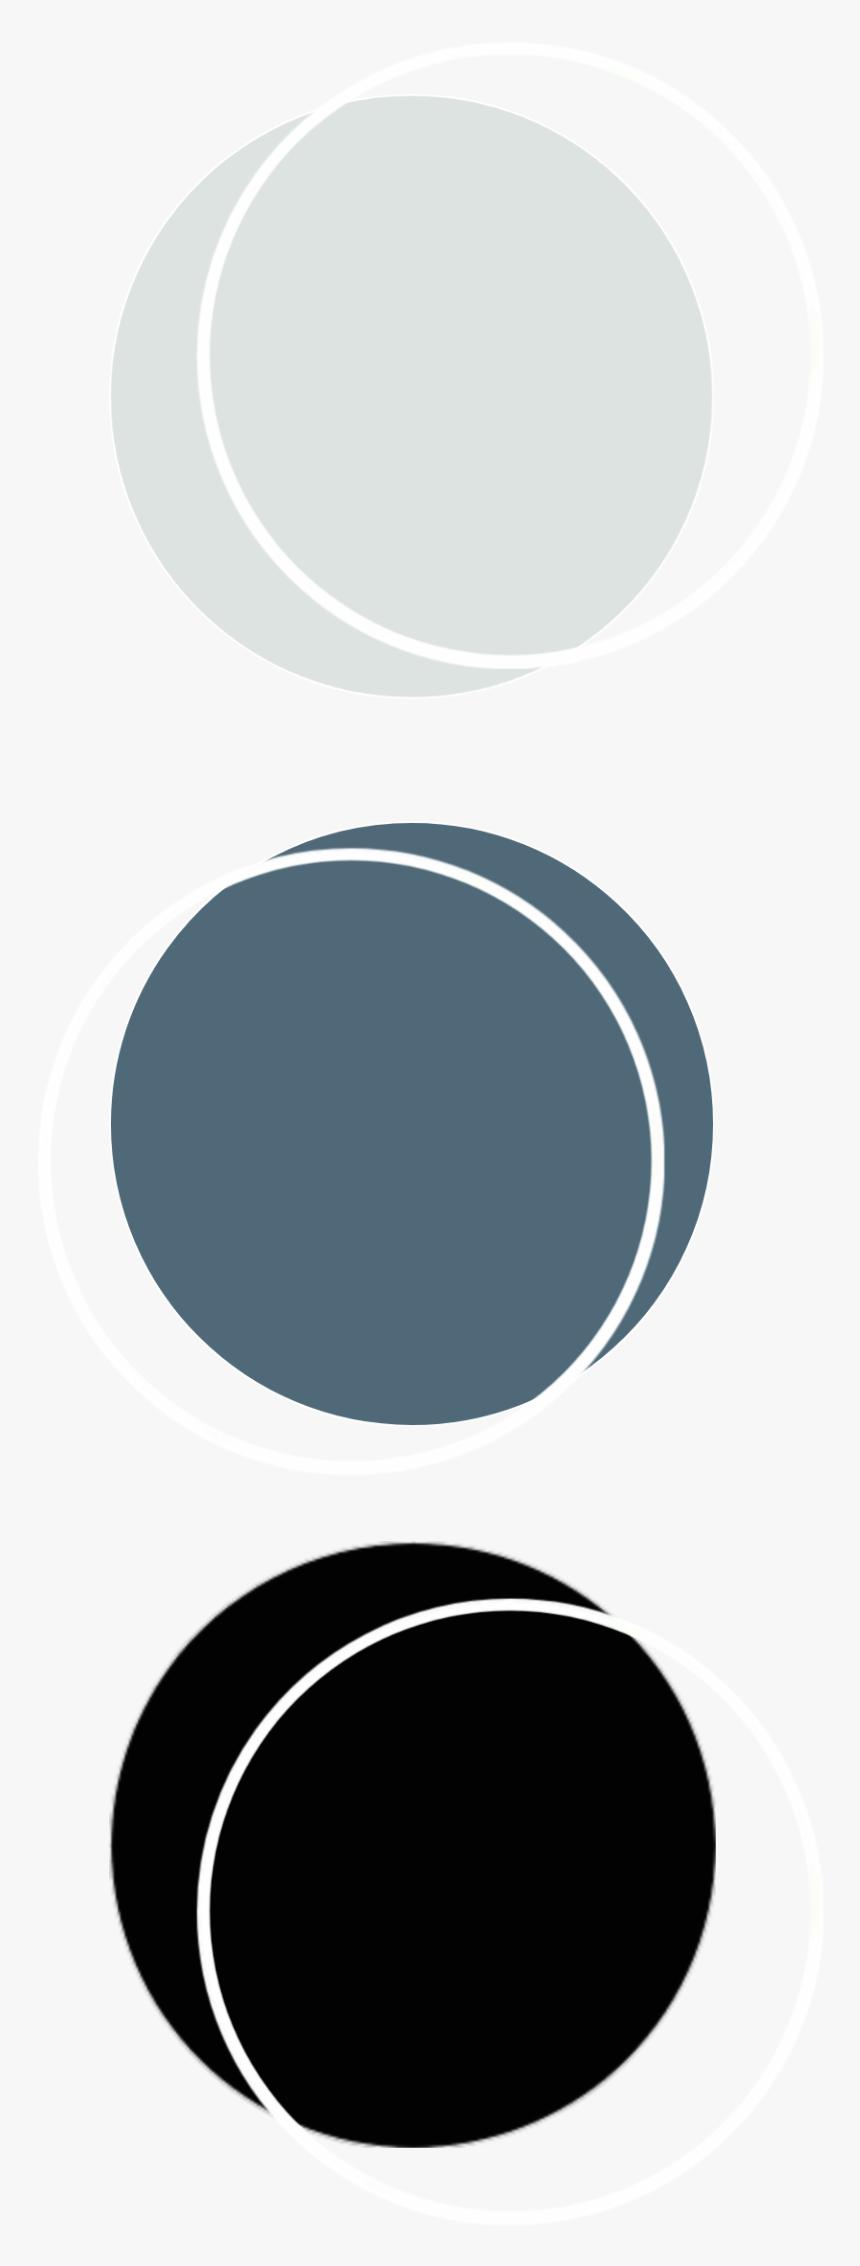 540 5400203 color black palette anatomy aesthetic kpop aesthetic color